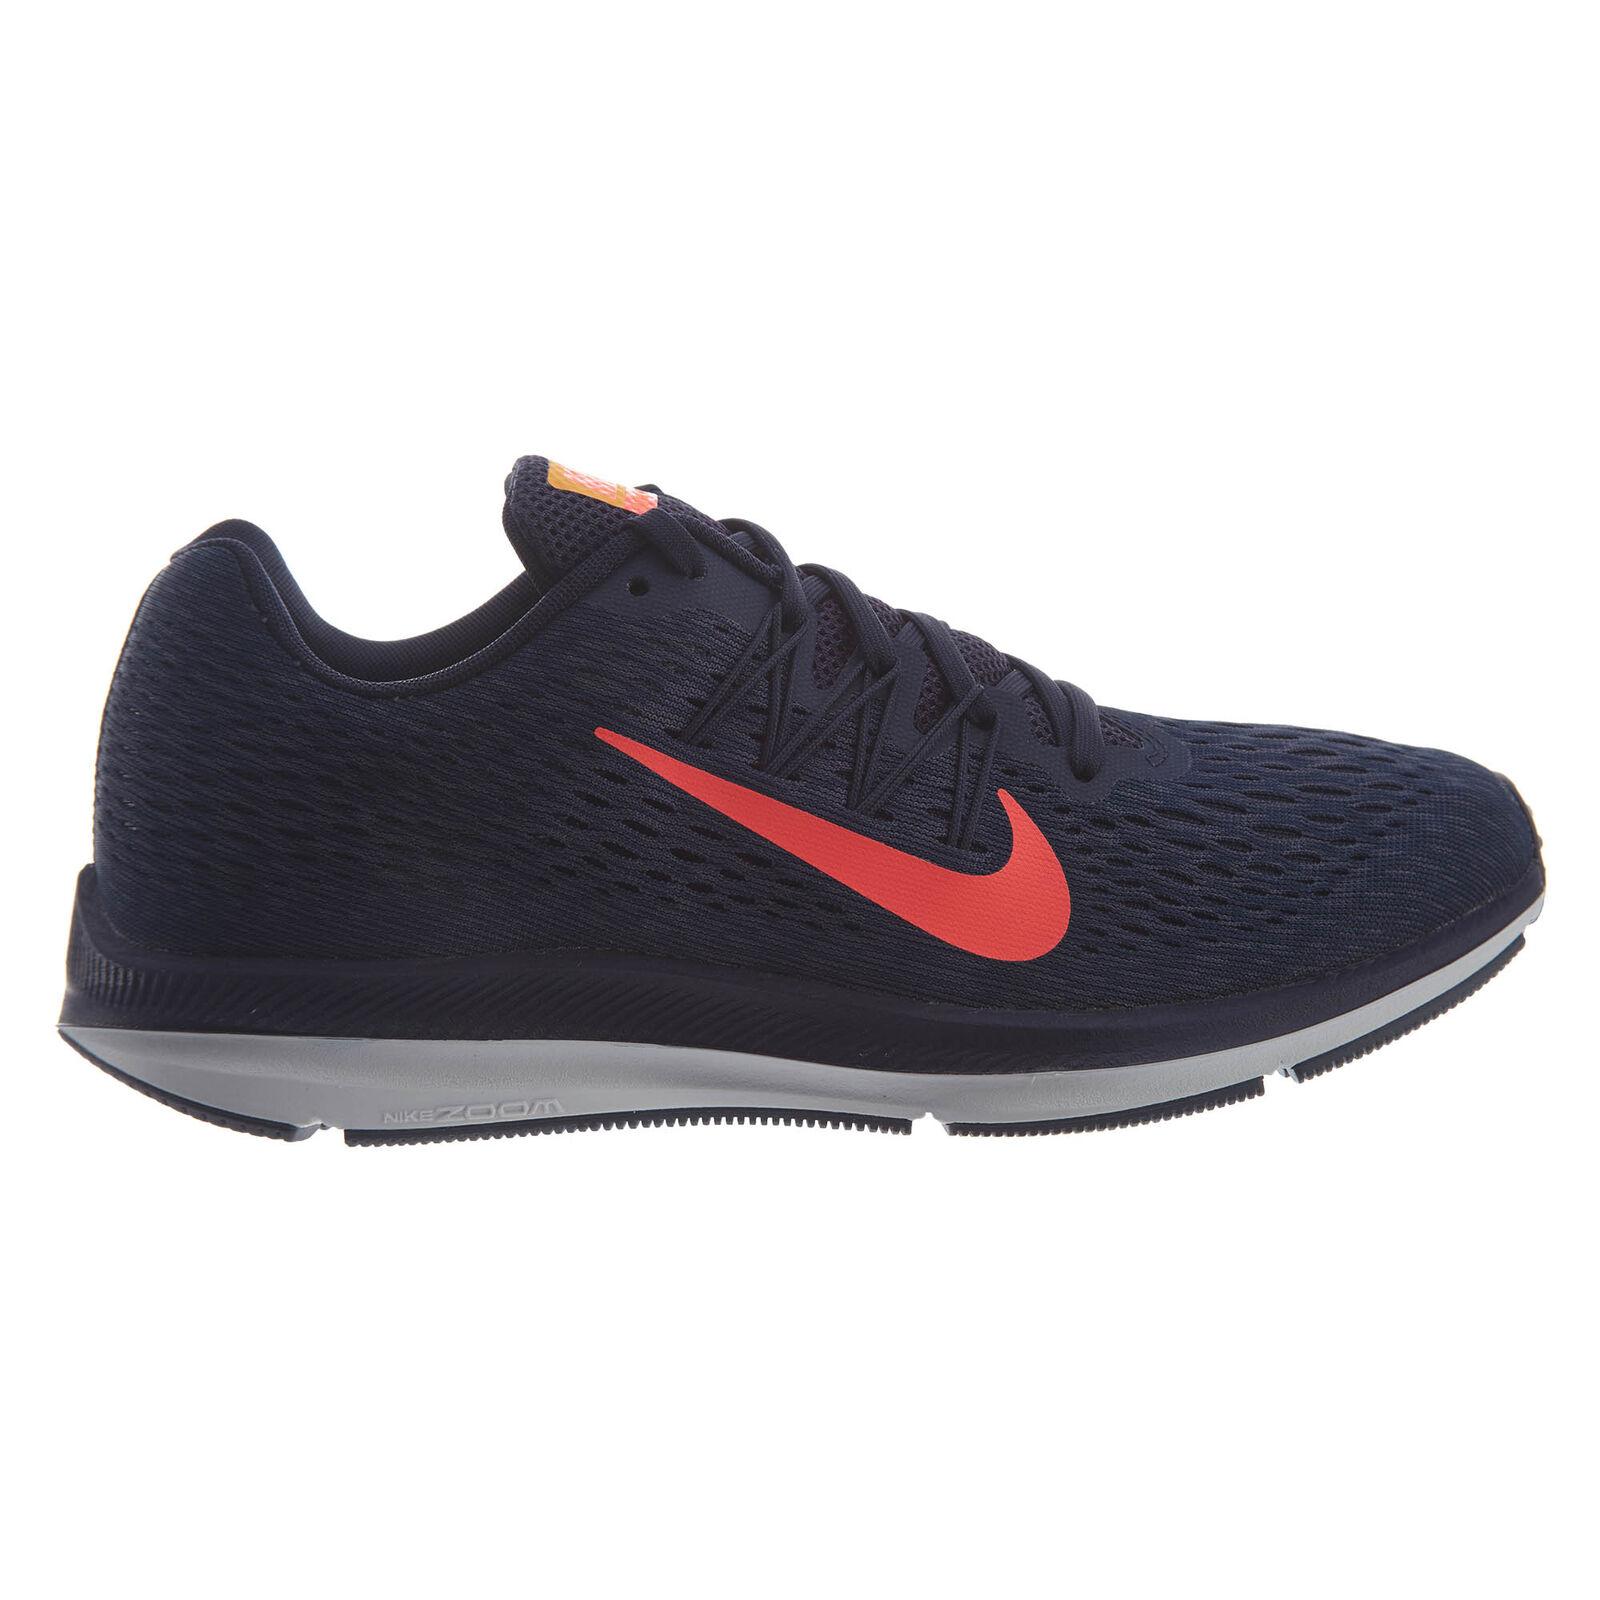 Nike Zoom Winflo Winflo Winflo 5 Uomo AA7406-402 neroened blu Crimson Running scarpe Dimensione 11 e26479